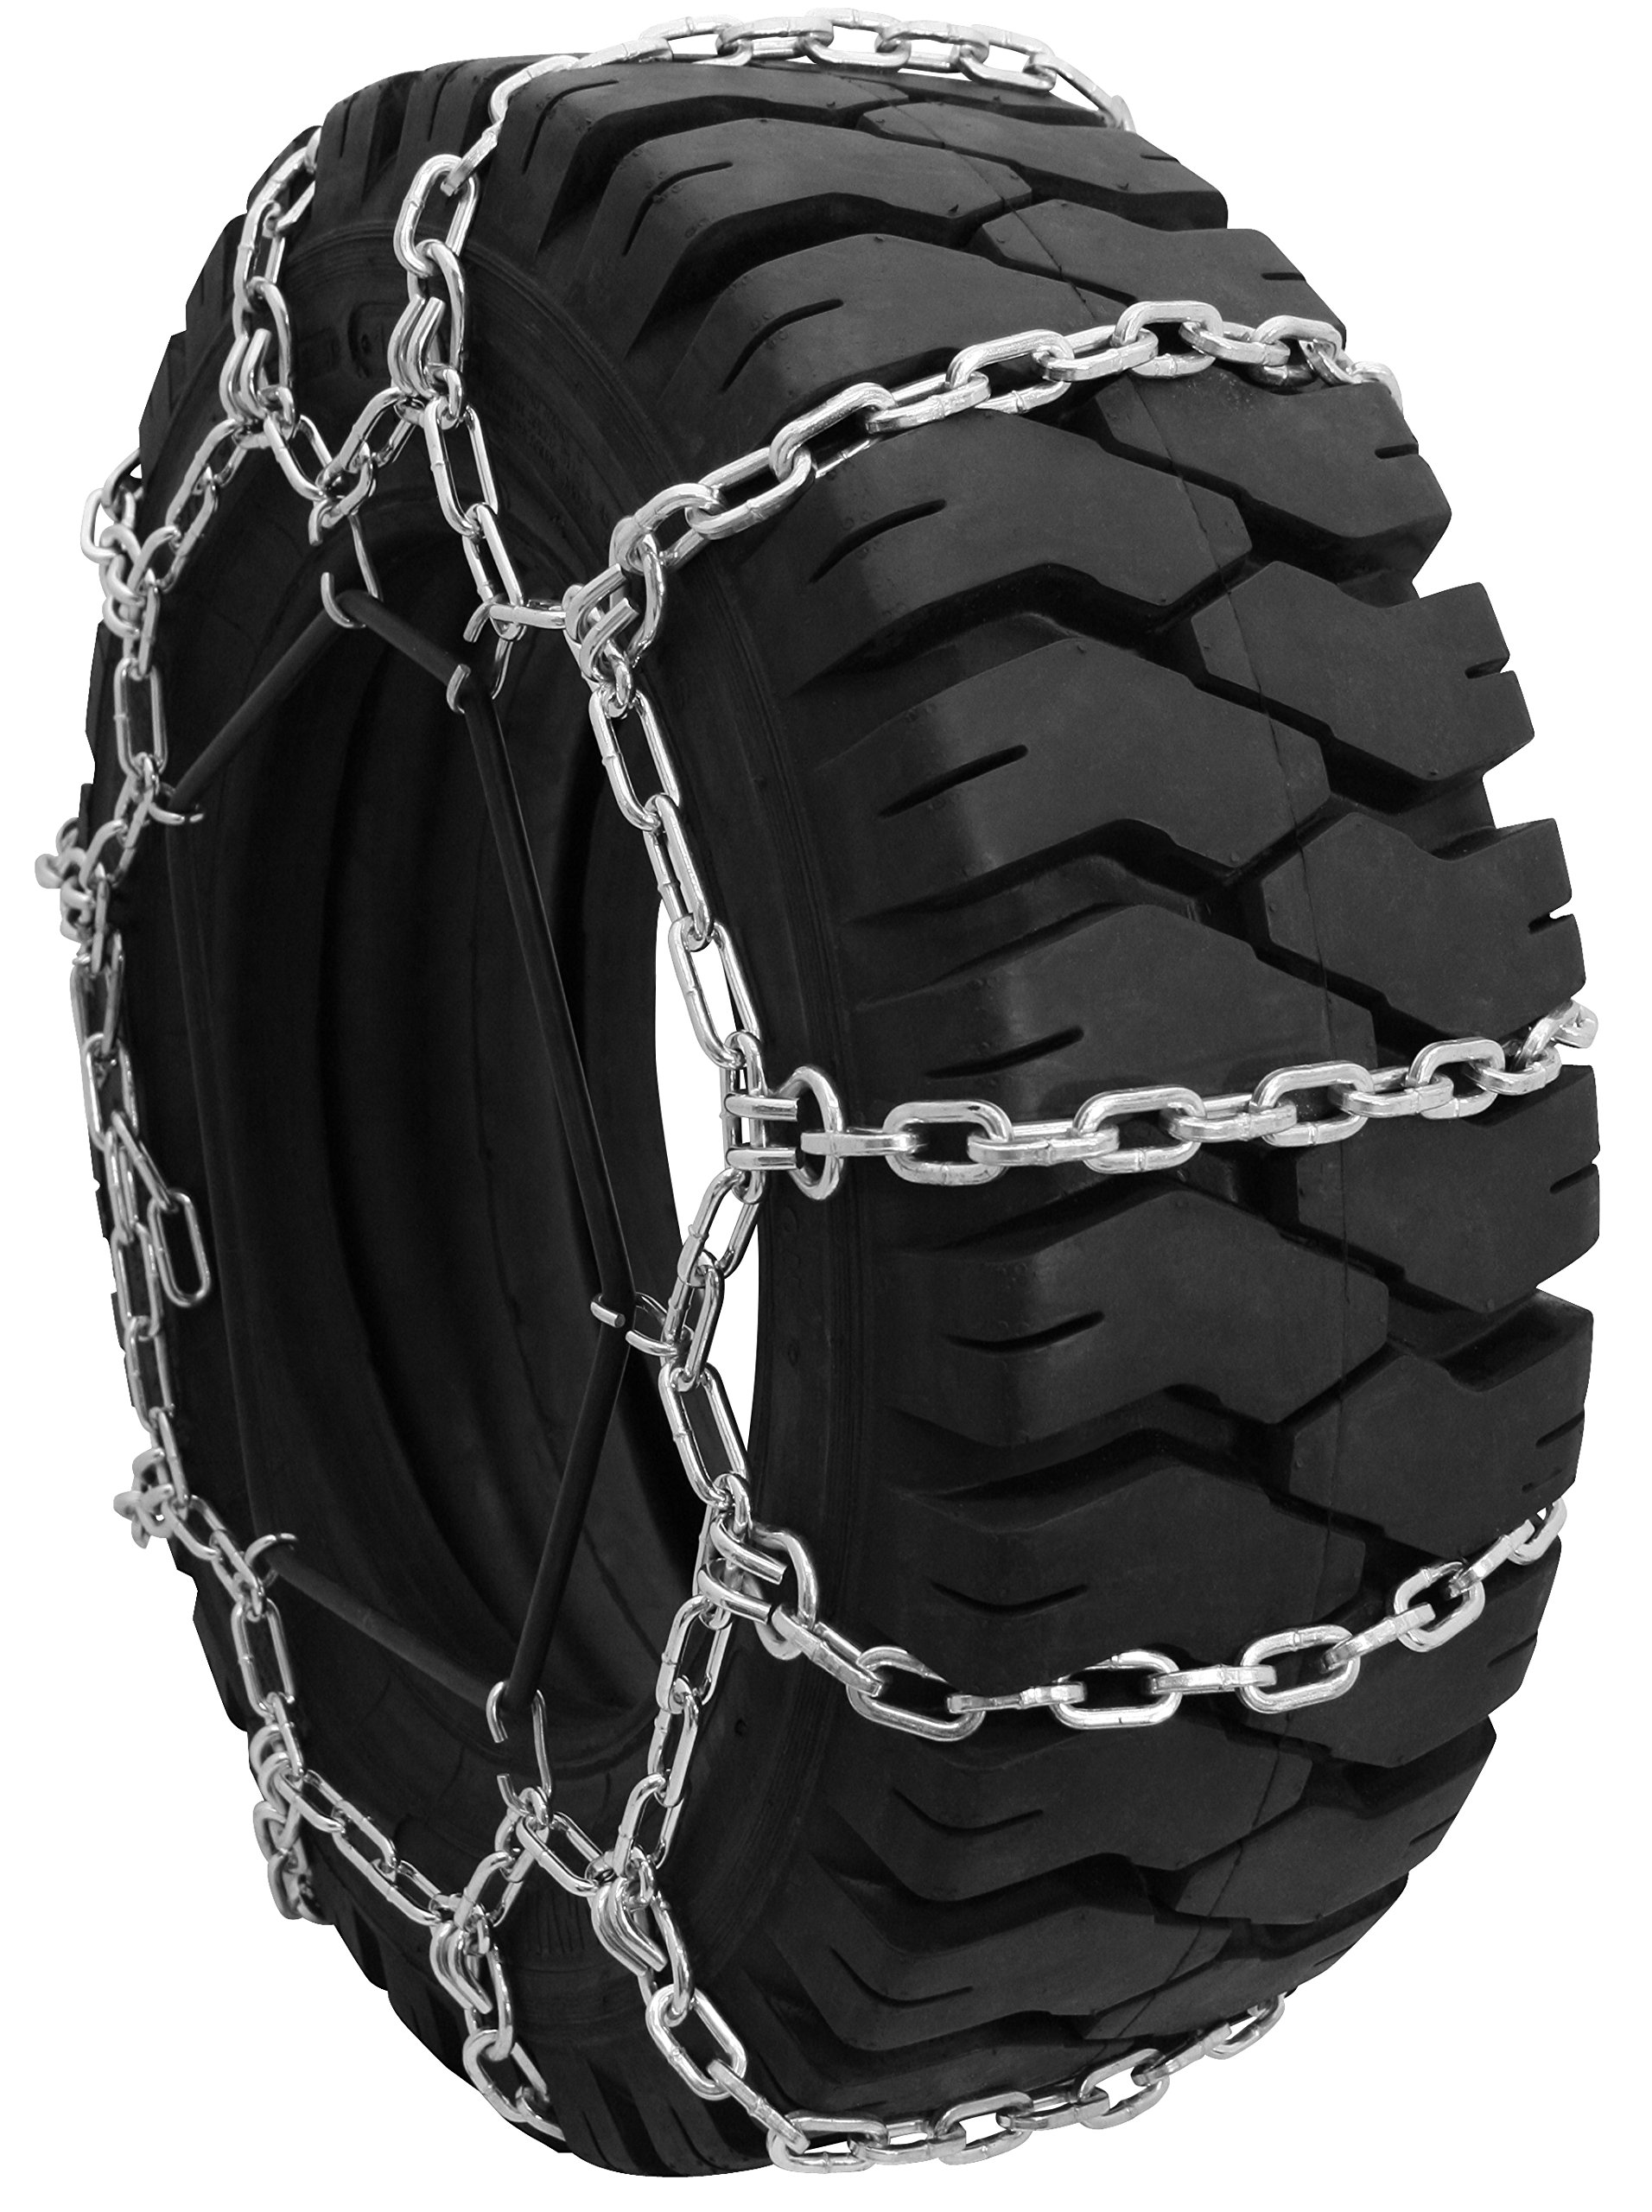 GTU-103 Square Rod Forklift chain 6x12, 6.50-10